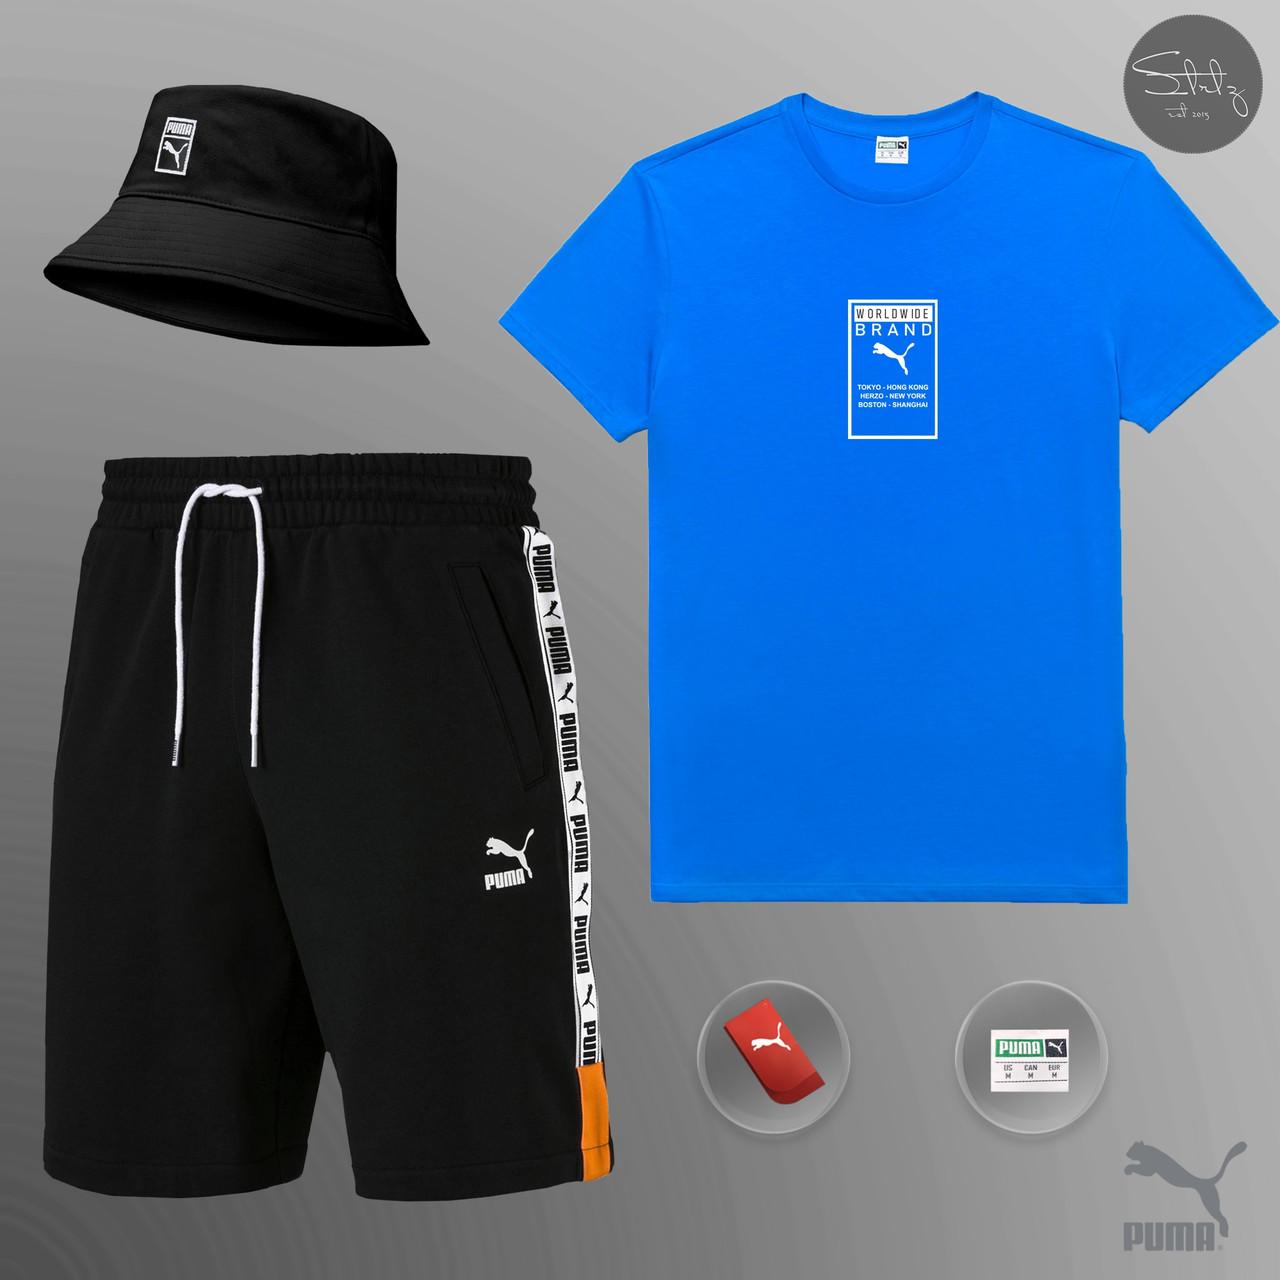 Мужской летний комплект Puma (шорты, футболка, панама), шорты пума, футболка пума, панама пума